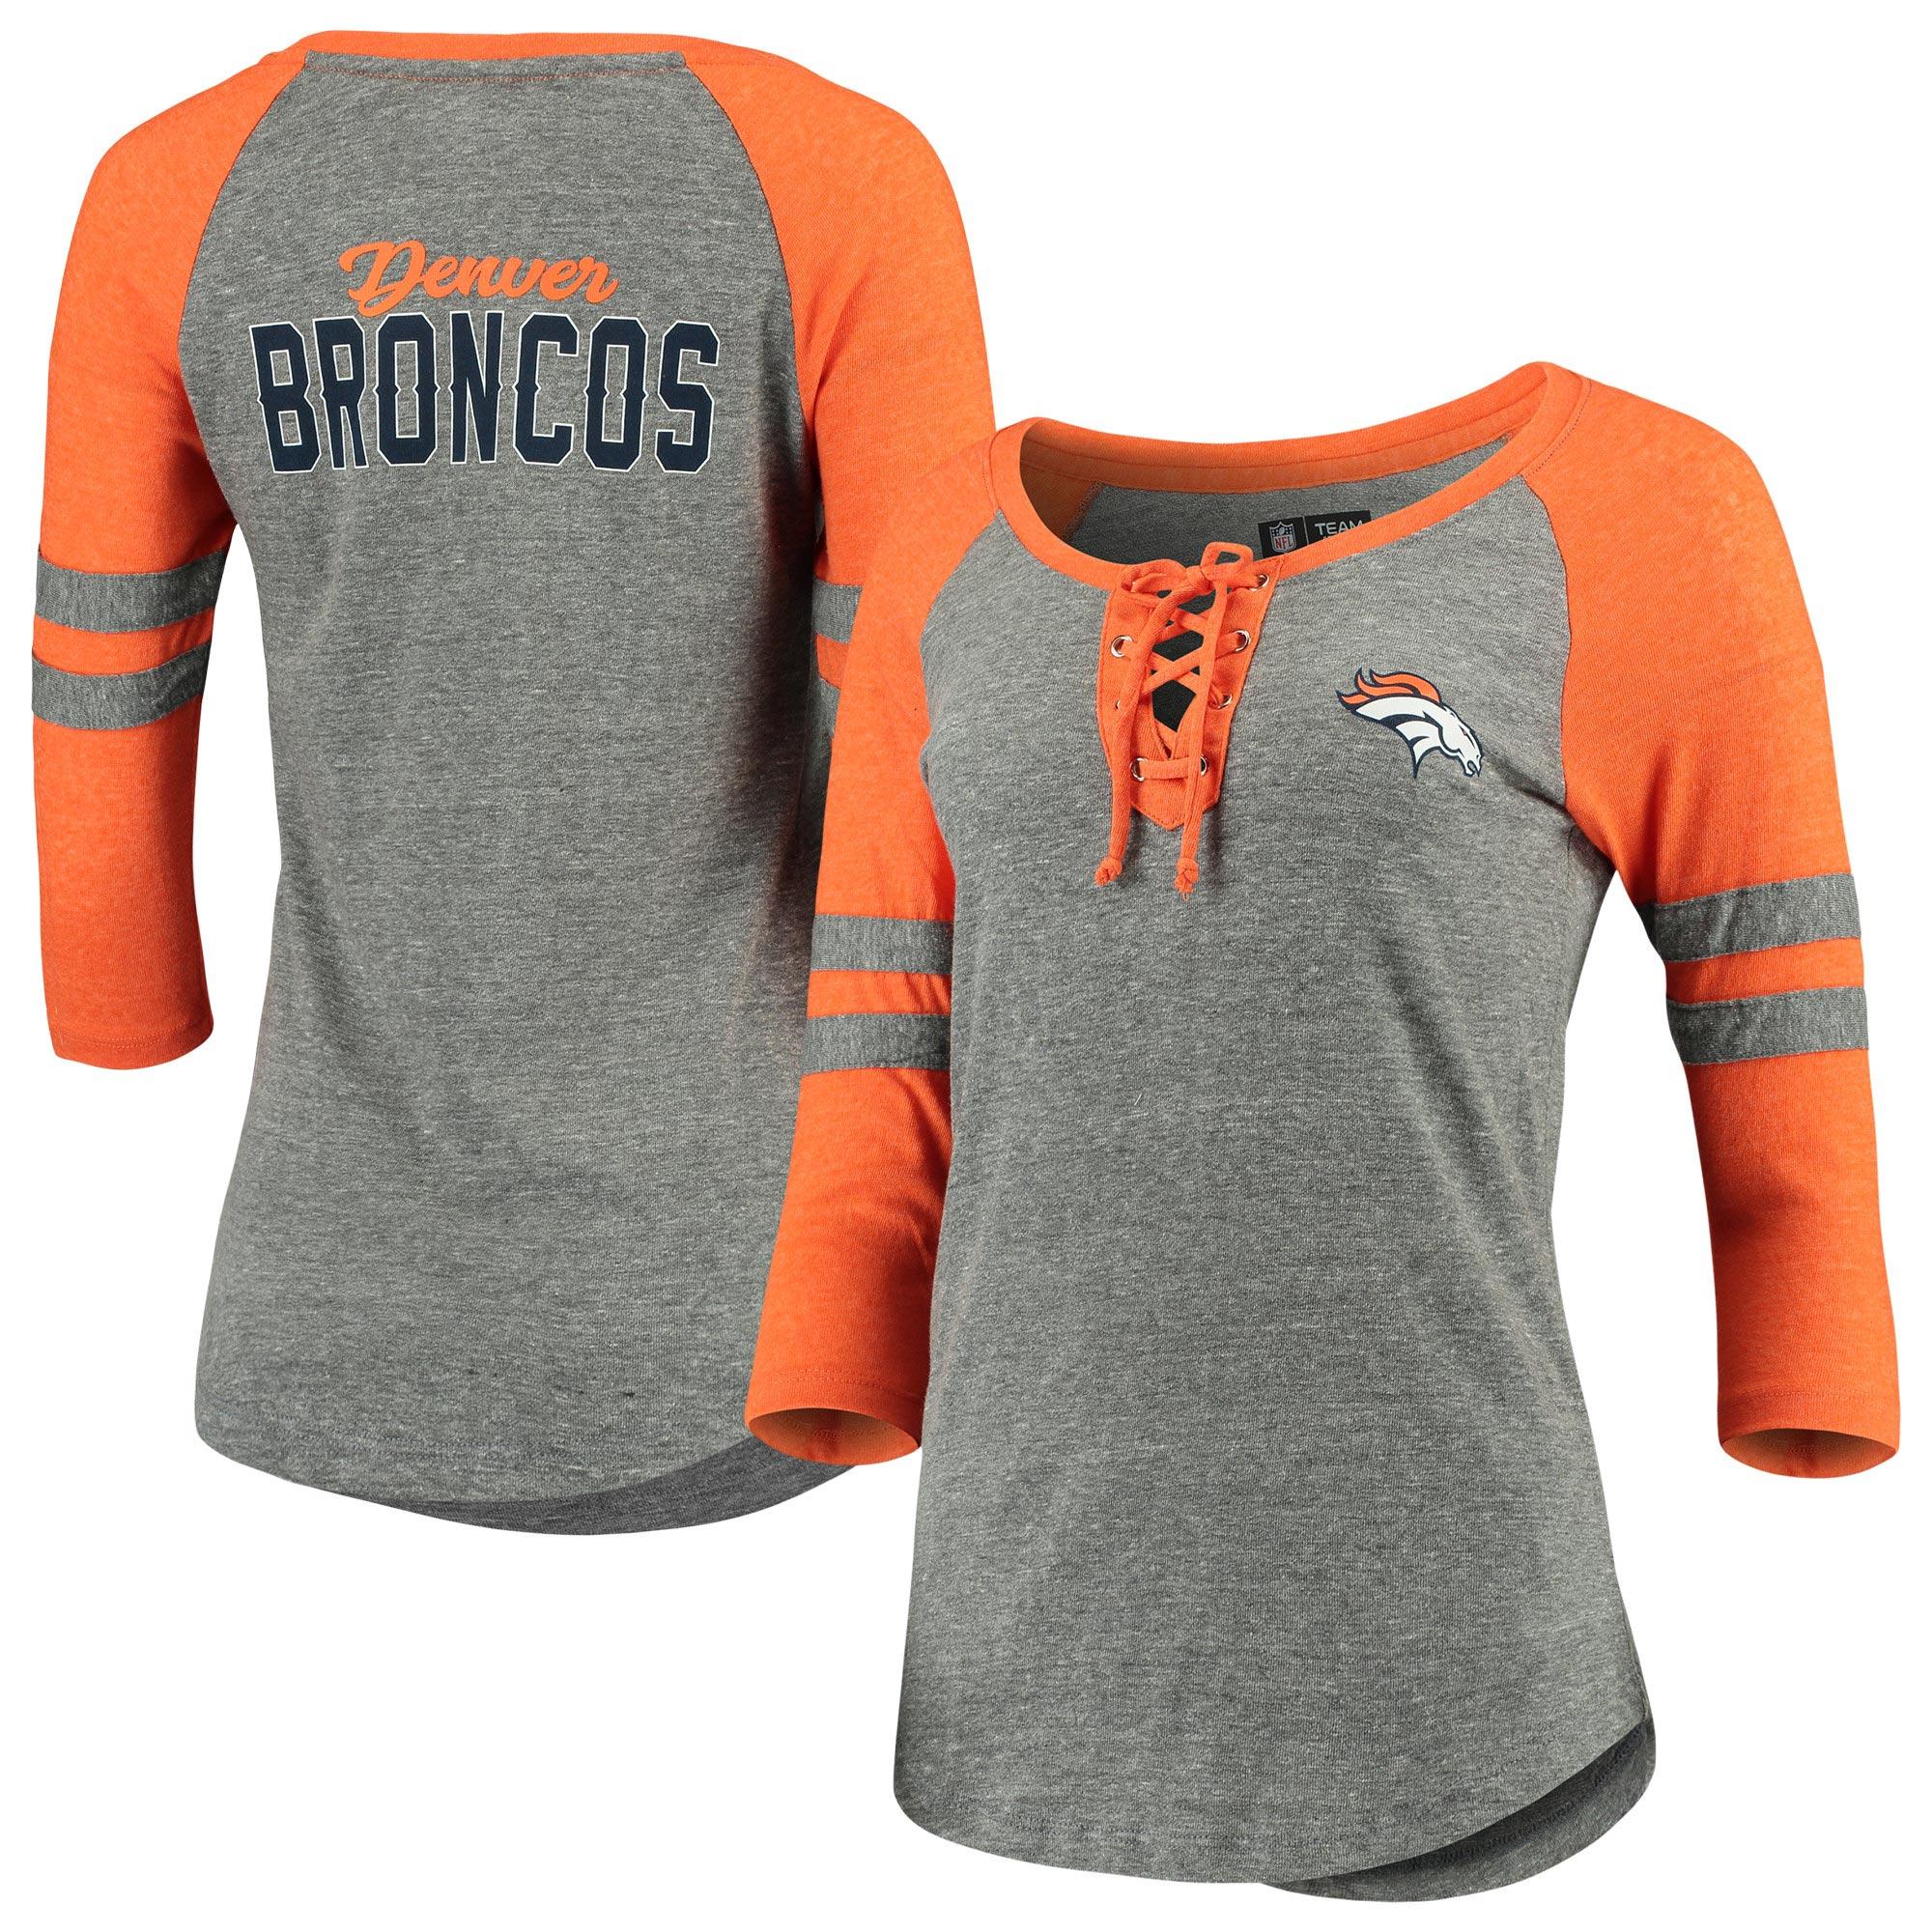 Denver Broncos New Era Women's Tri-Blend 3/4-Sleeve Raglan Laceup T-Shirt - Heathered Gray